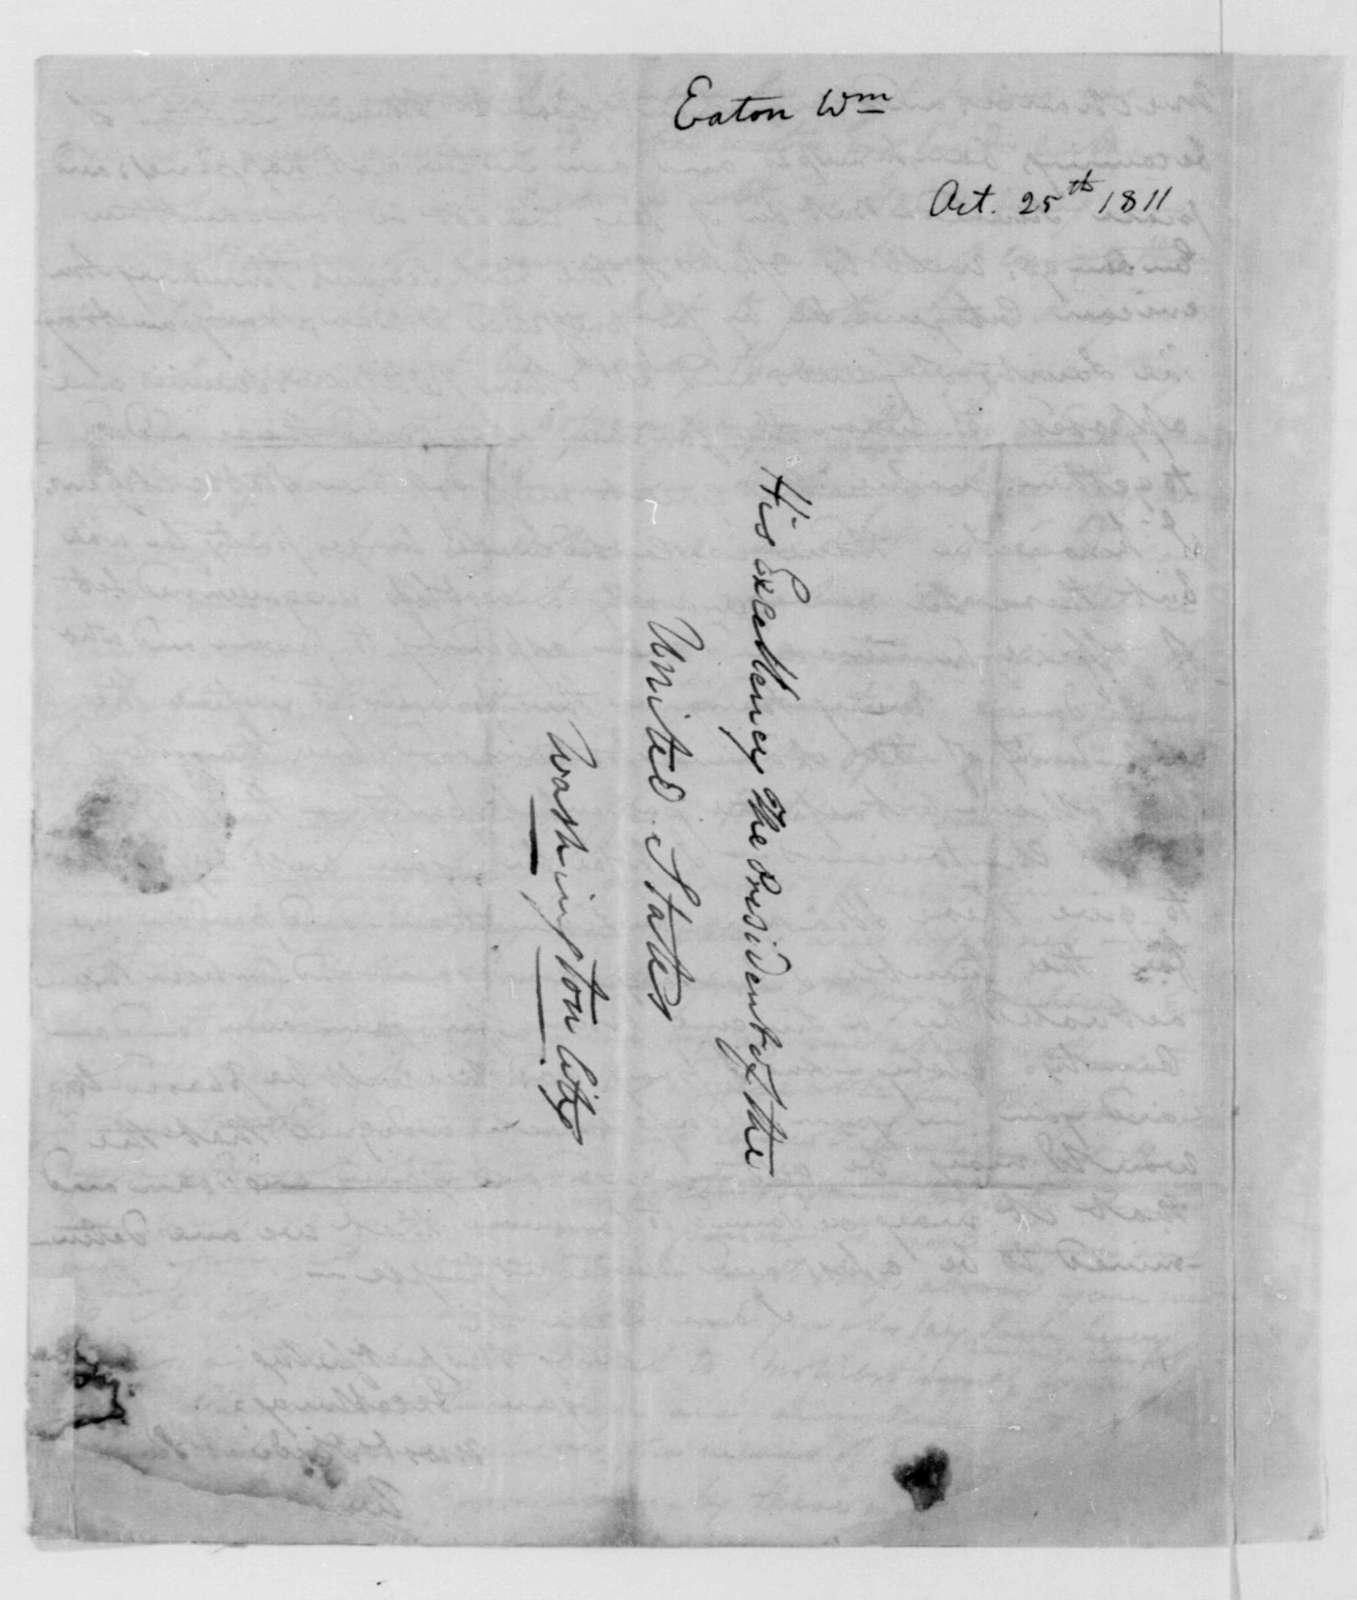 William Eaton to James Madison, October 25, 1811.